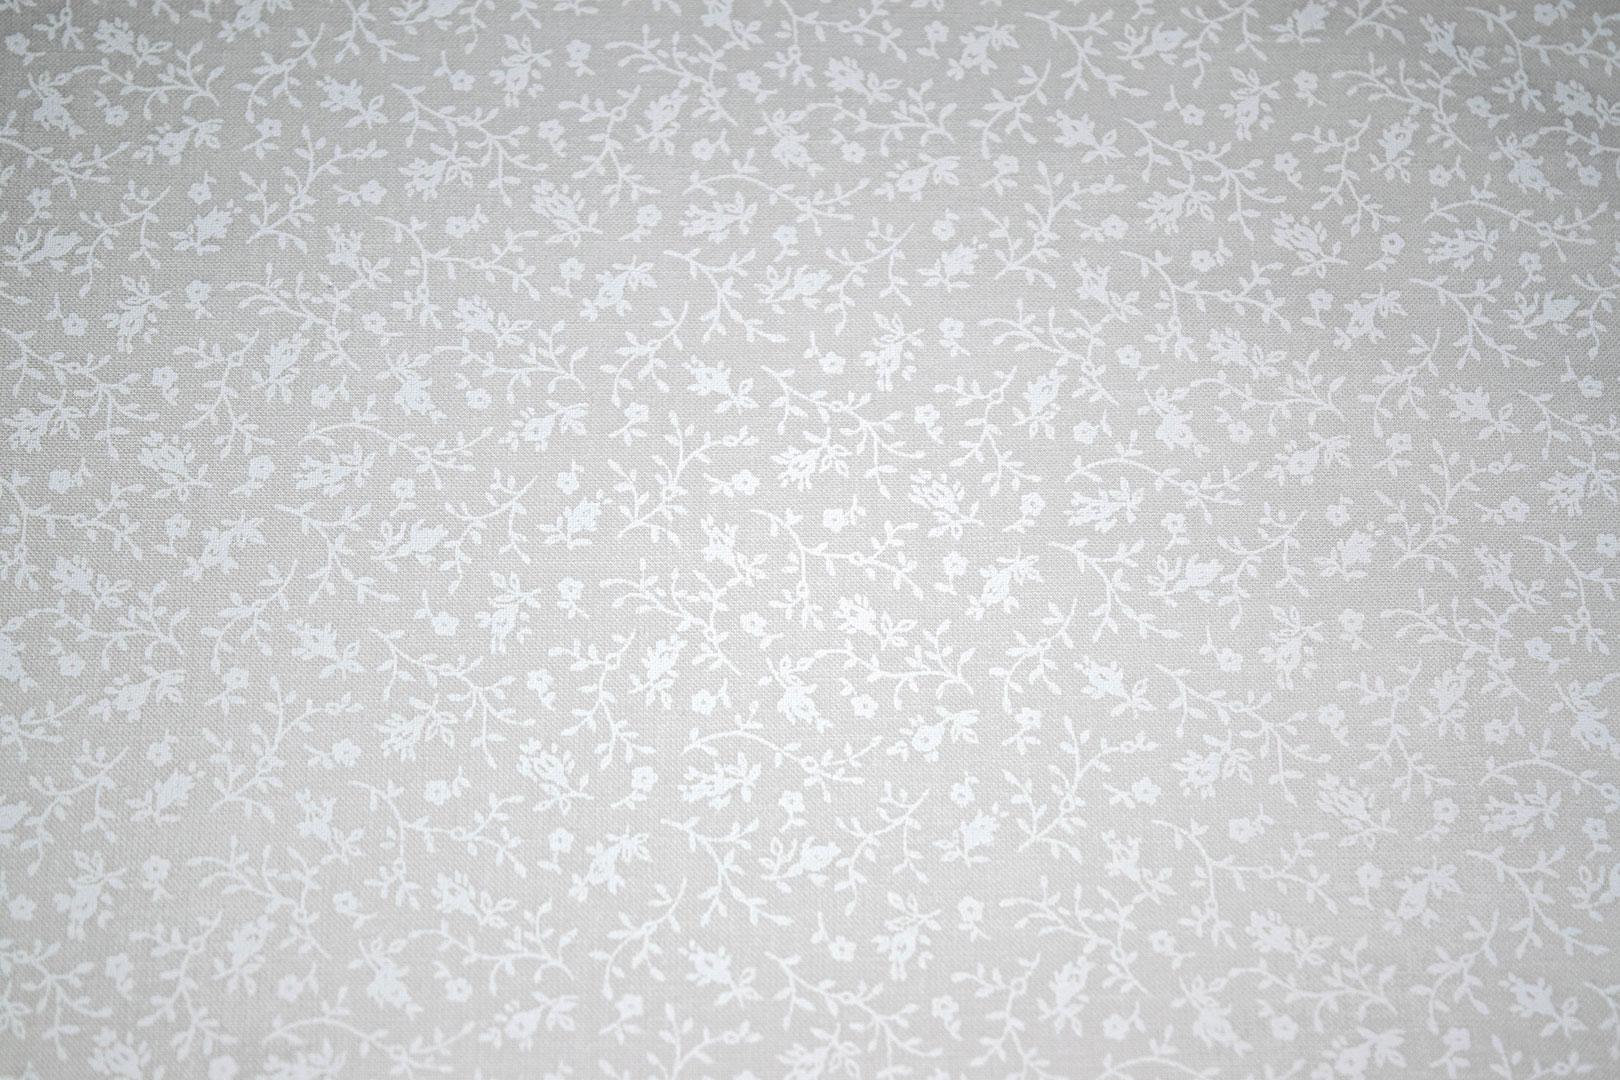 "8_22015_ww   44/45"" 68/68, 100% Carded Cotton"